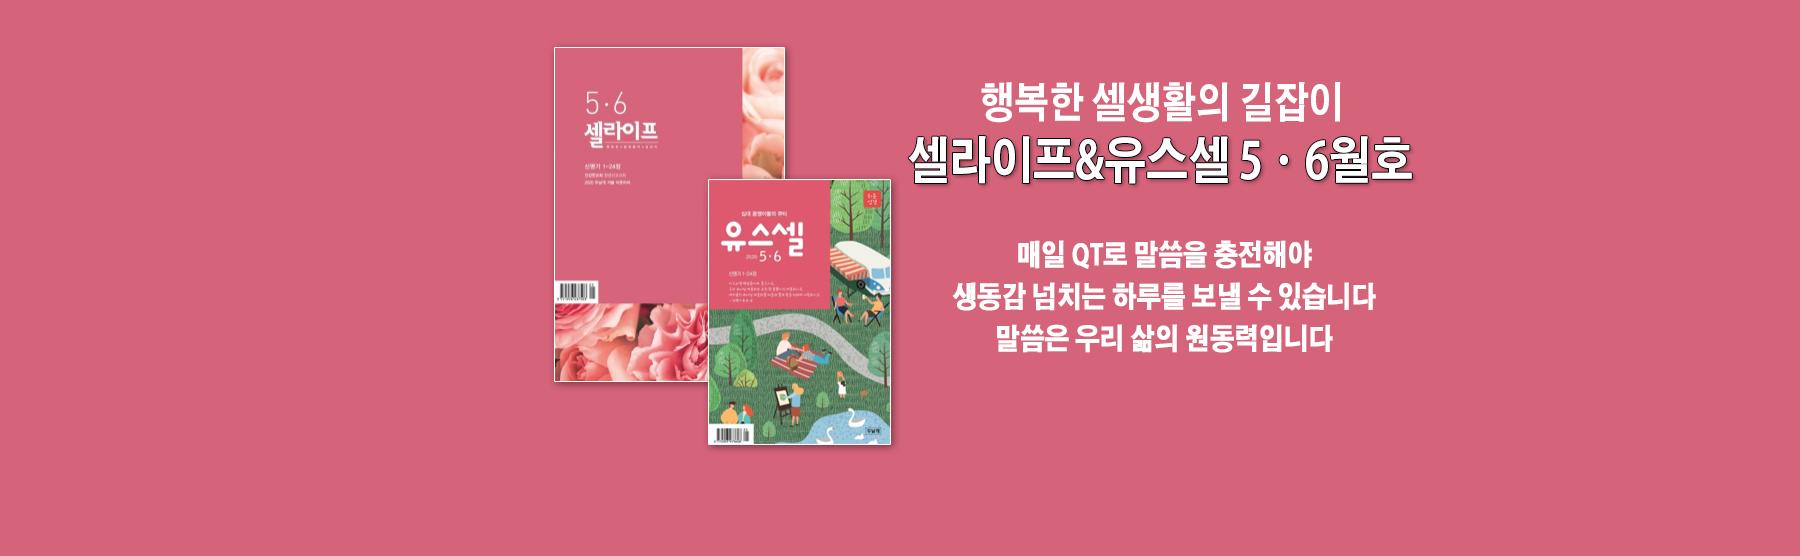 banner-셀라이프56월호-2